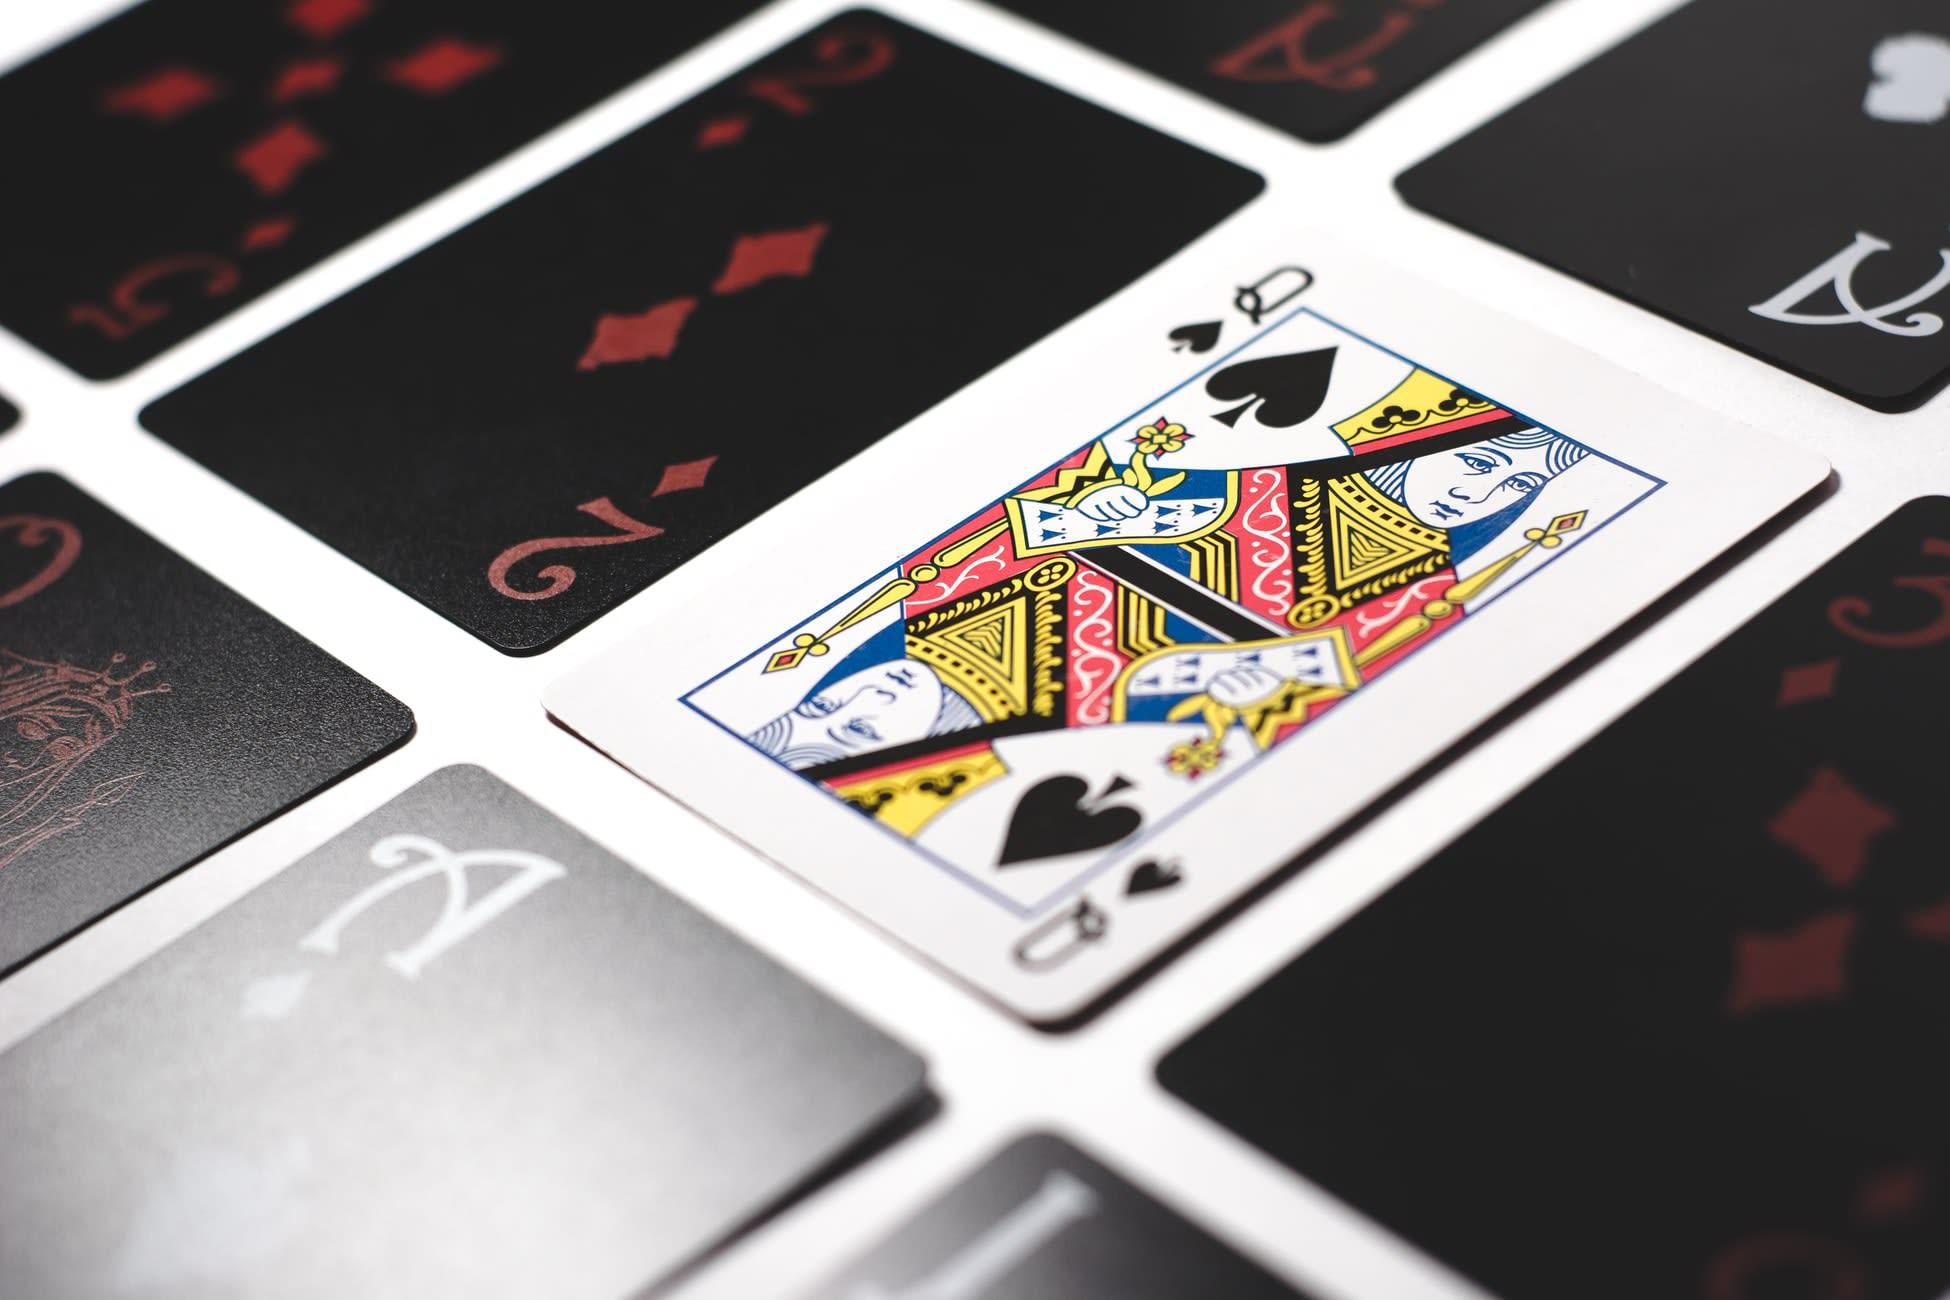 Årsaker til at Blackjack-populariteten øker